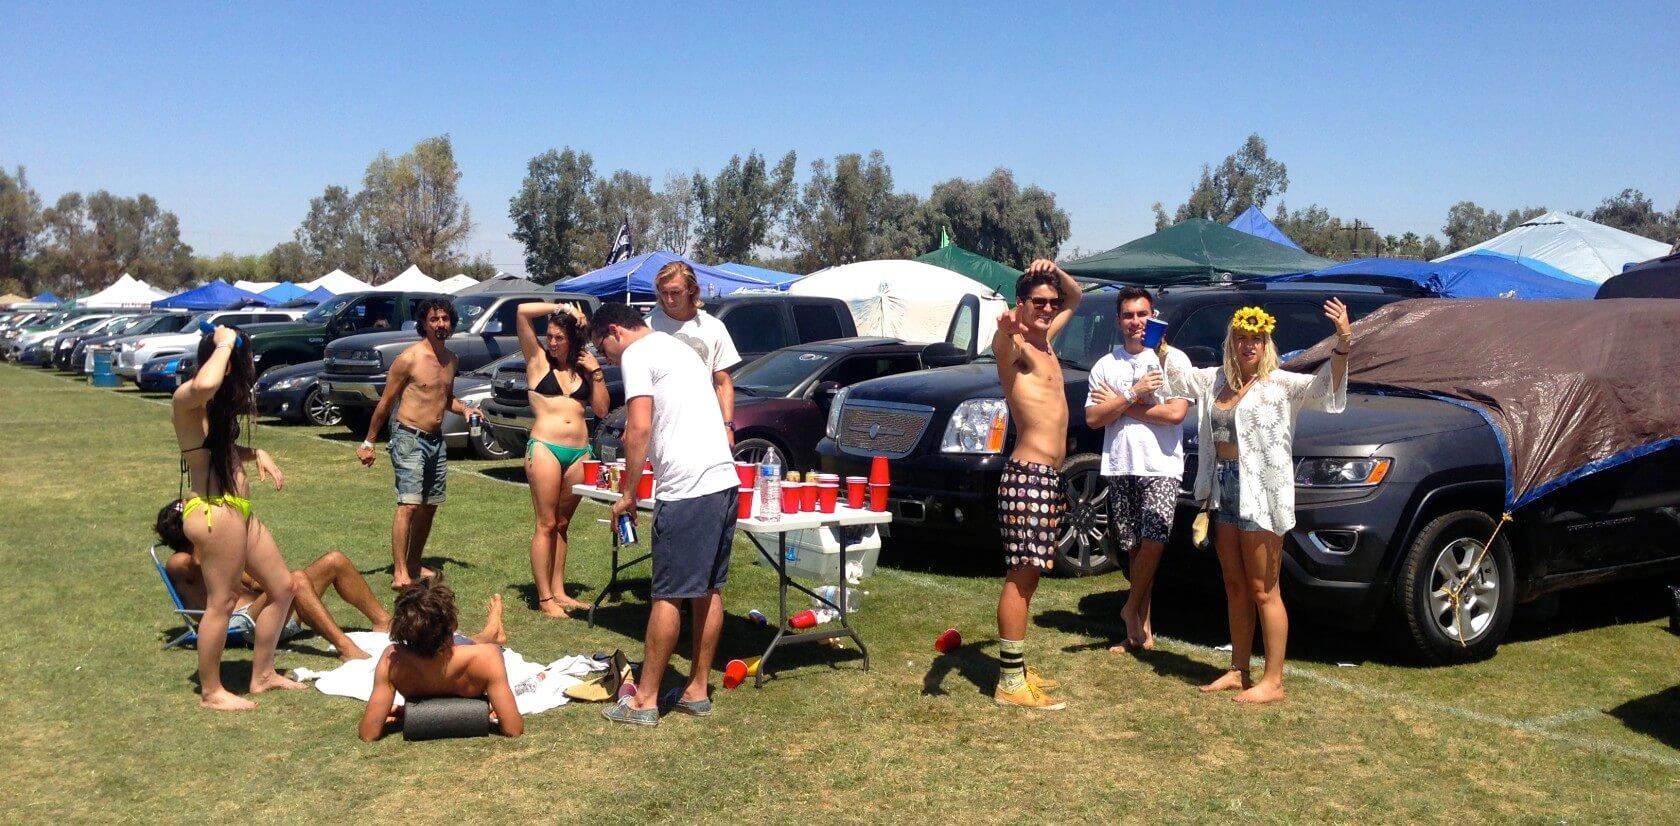 camping at coachella tips tricks and guide coachella review